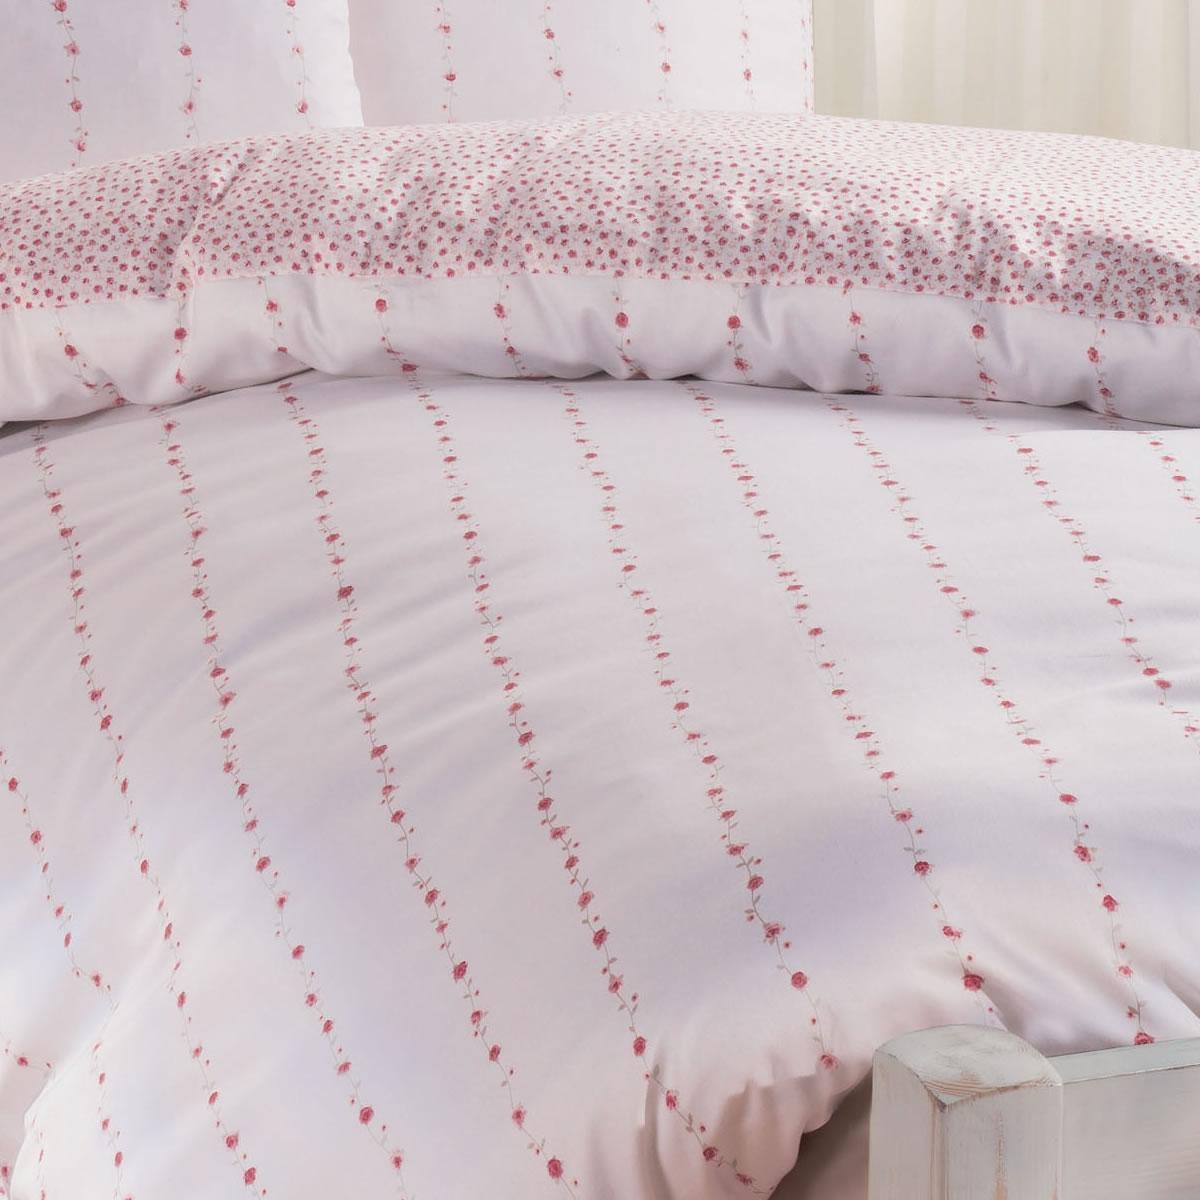 janine edel flanell bettw sche chinchilla romantico 7505 01 ros rosen. Black Bedroom Furniture Sets. Home Design Ideas